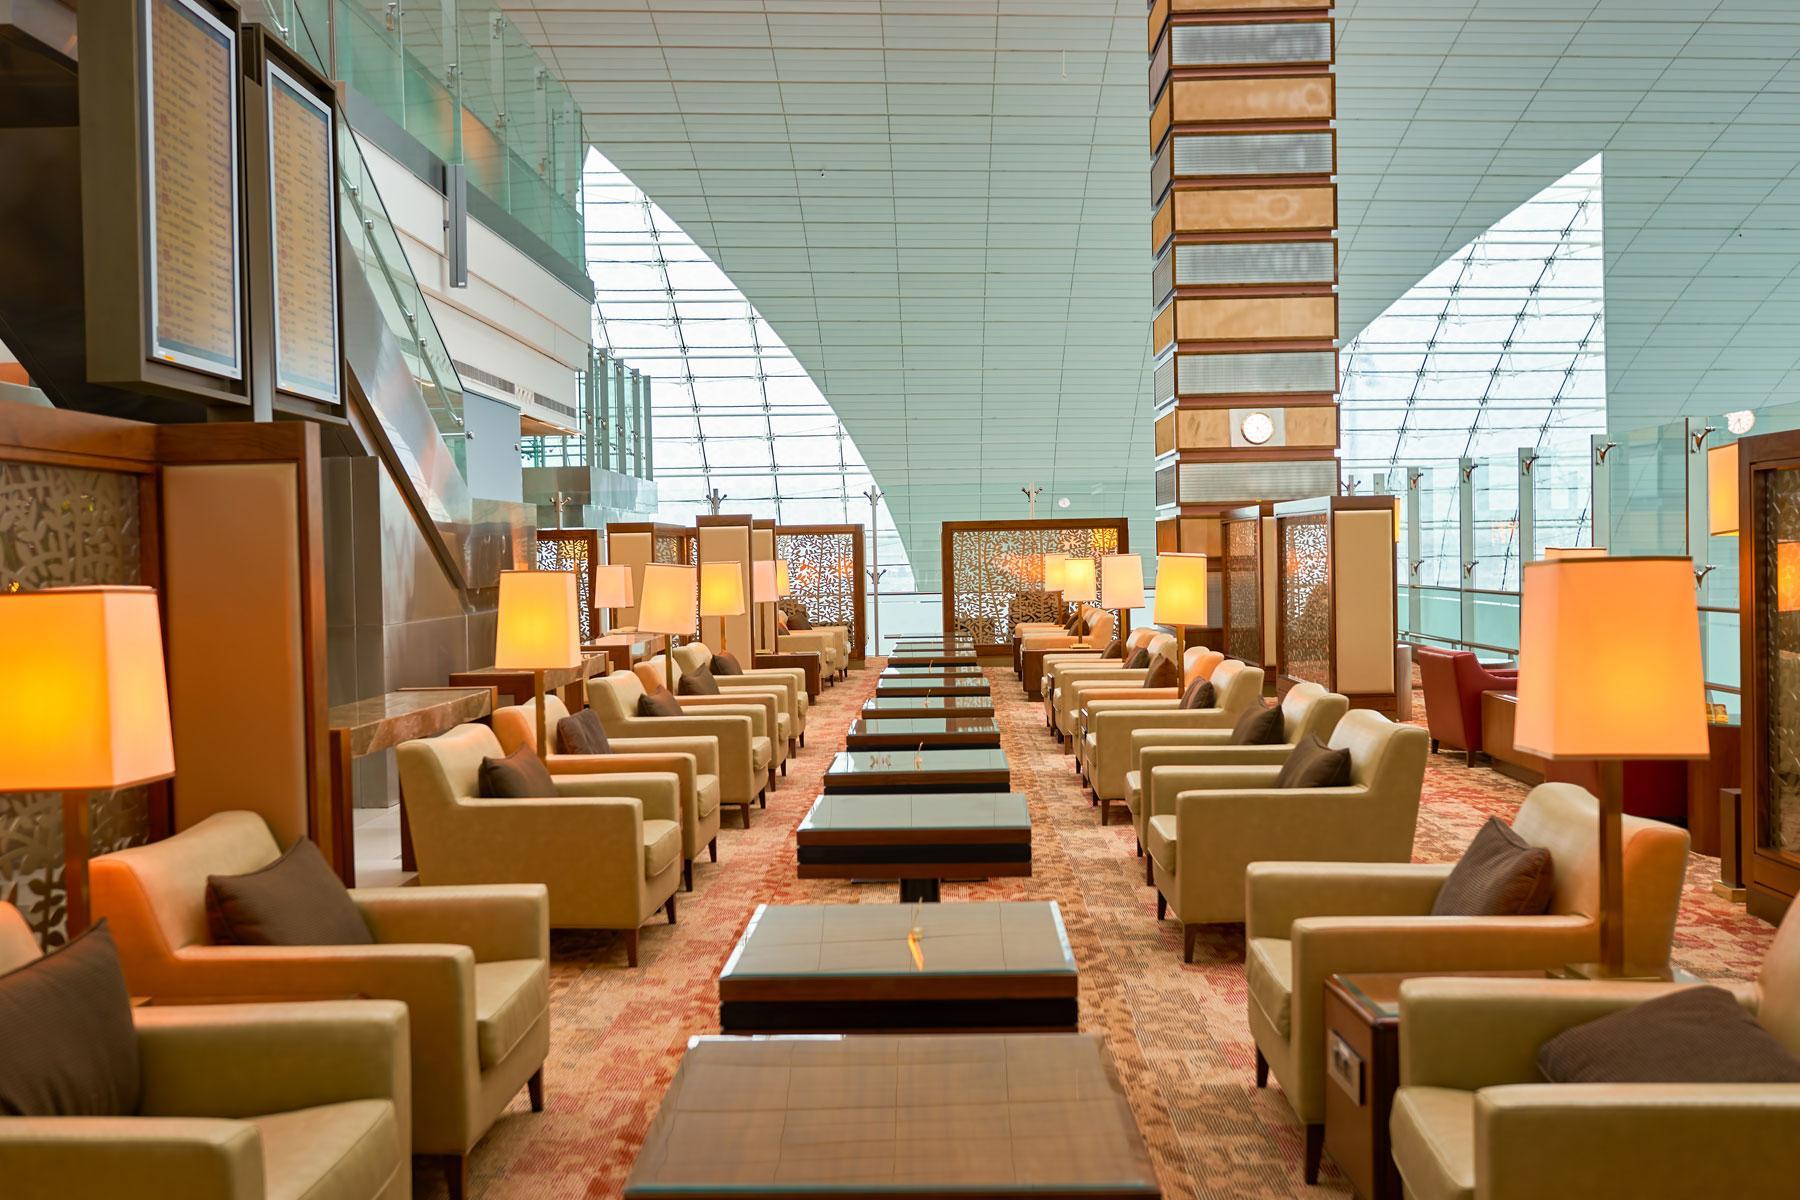 Sabiha Gokcen Airport Lounge